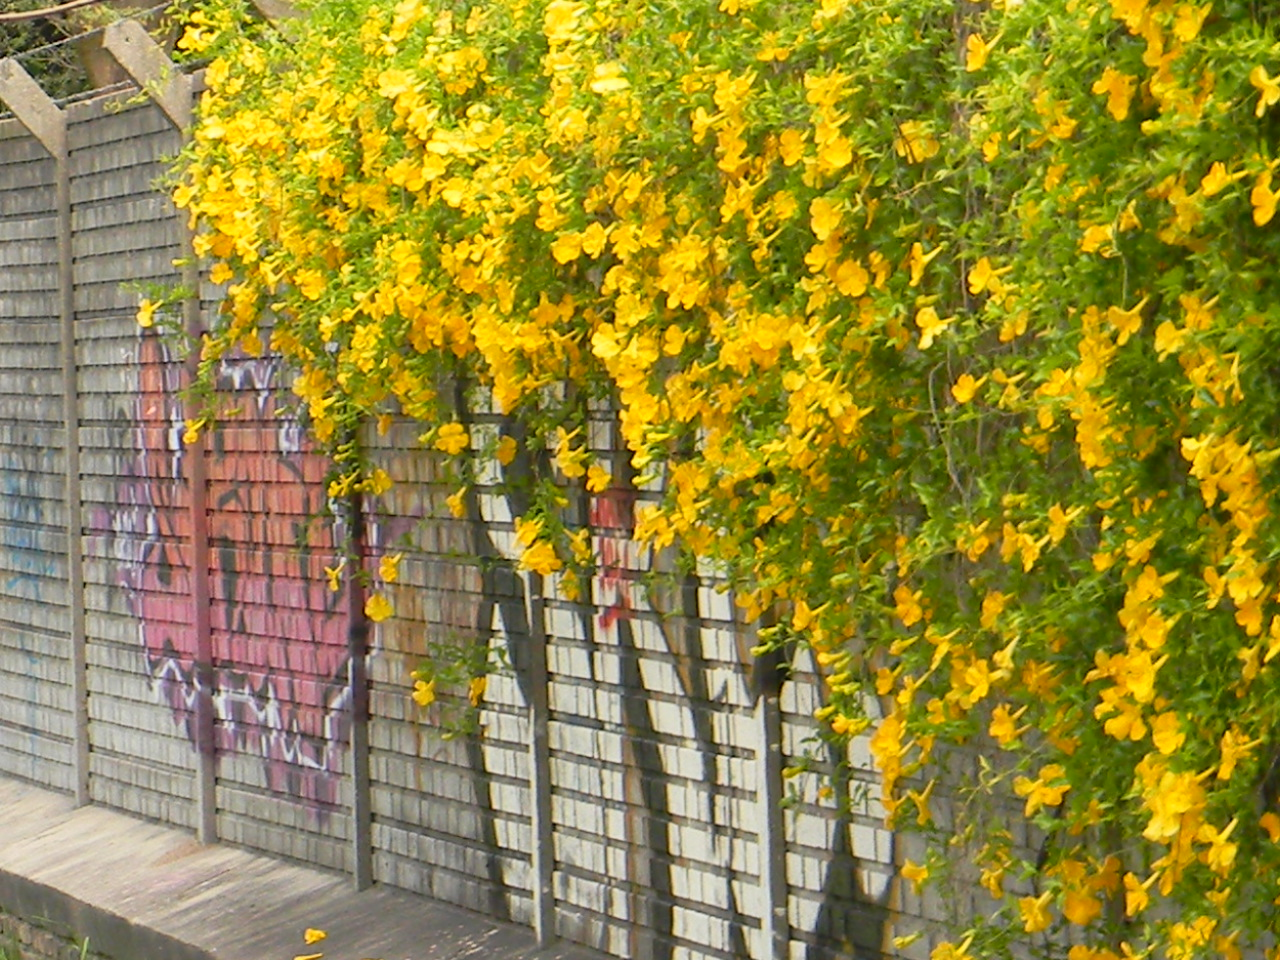 arte-urbano-002.jpg